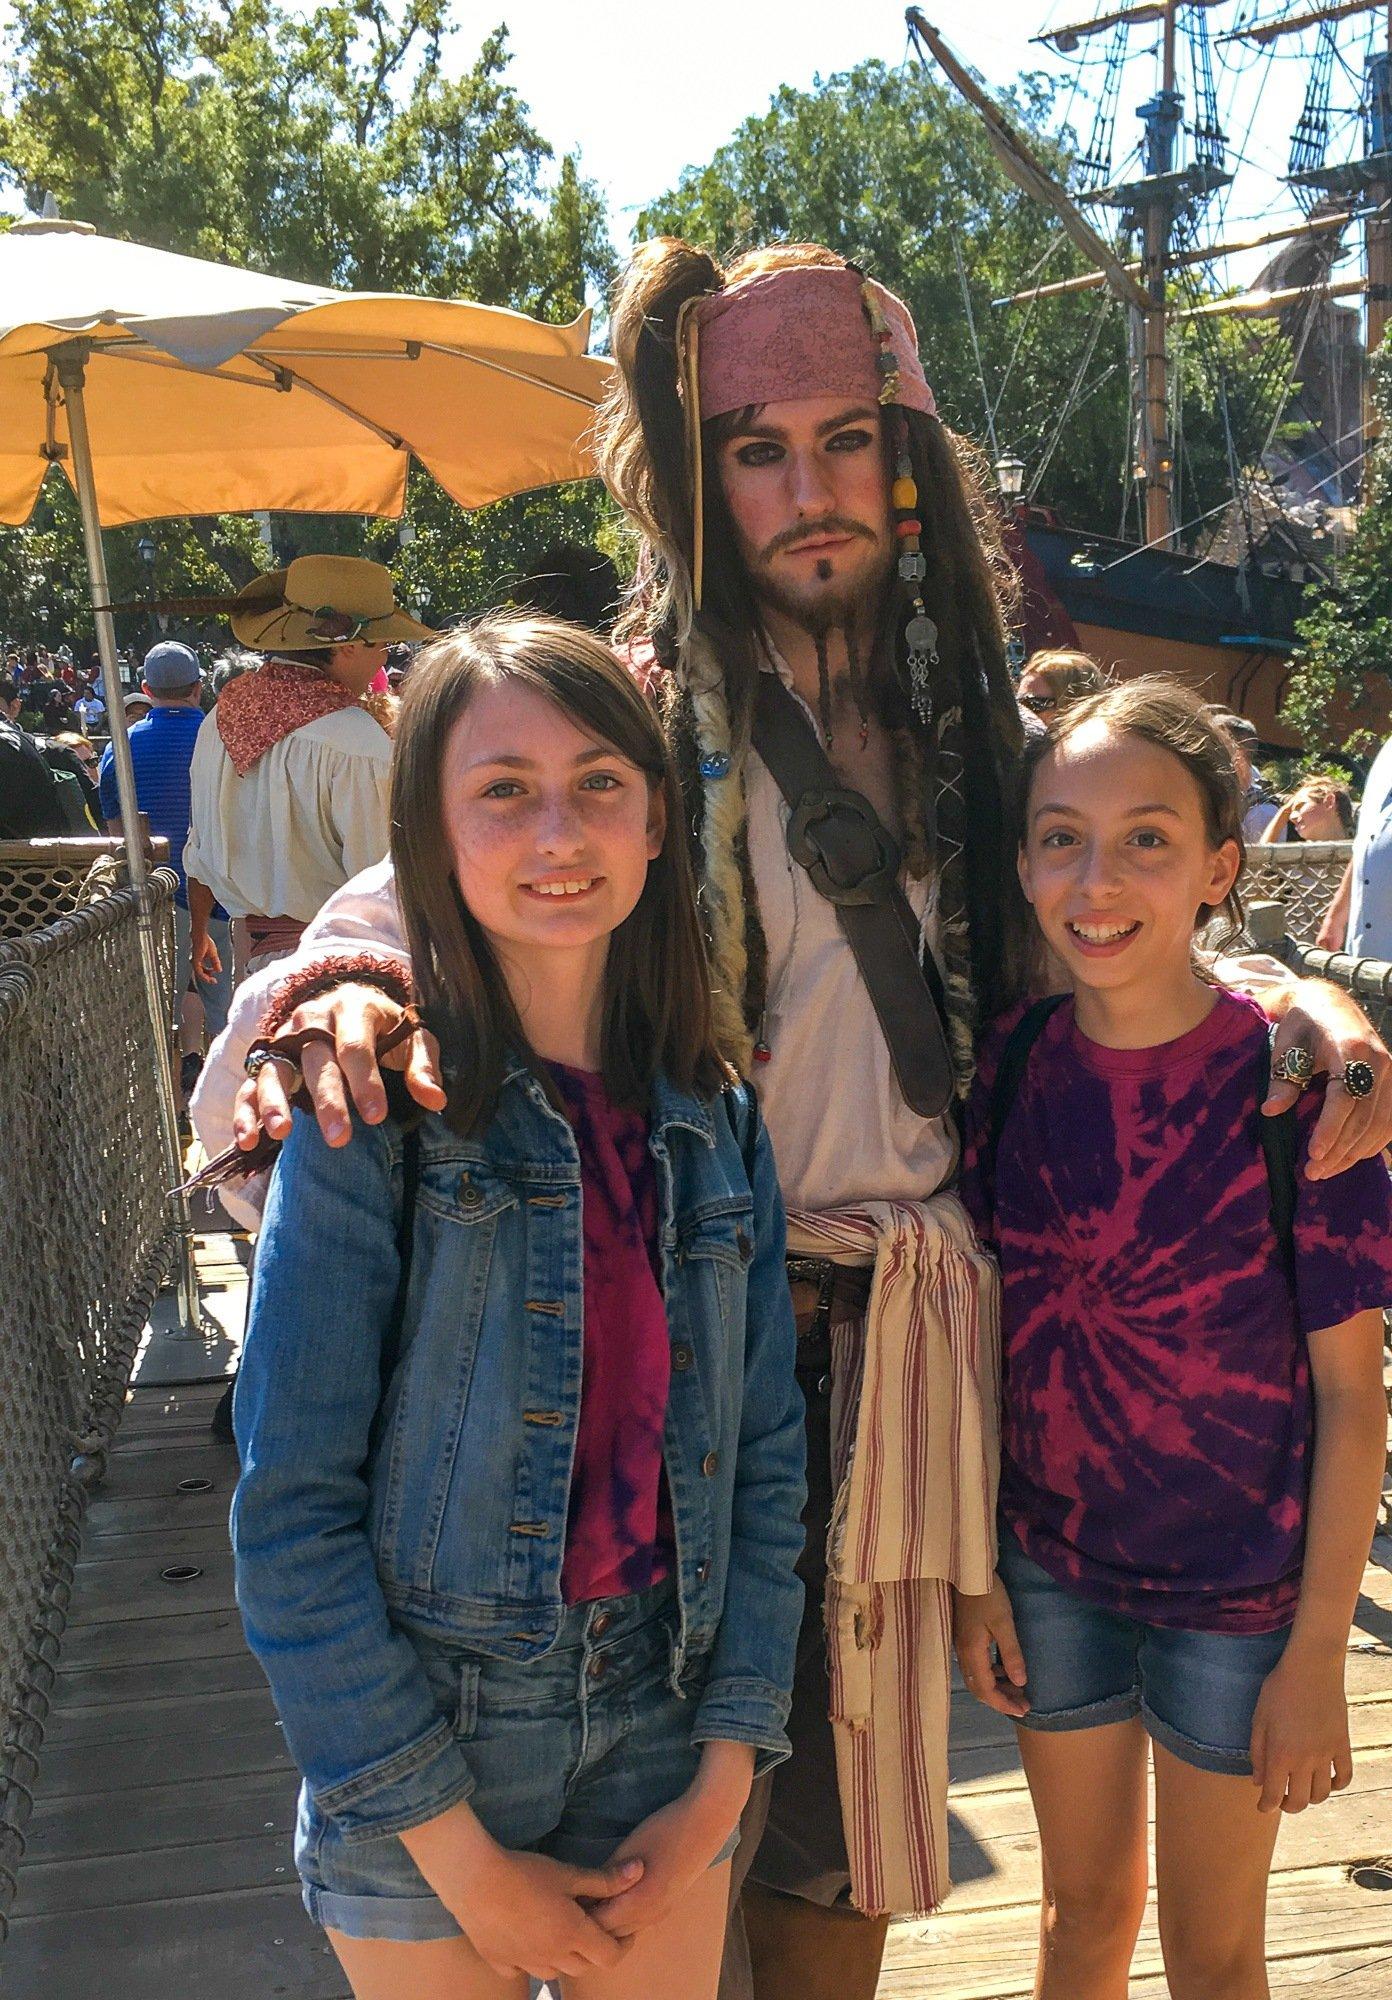 Teen girls with Captain Jack Sparrow at Disneyland